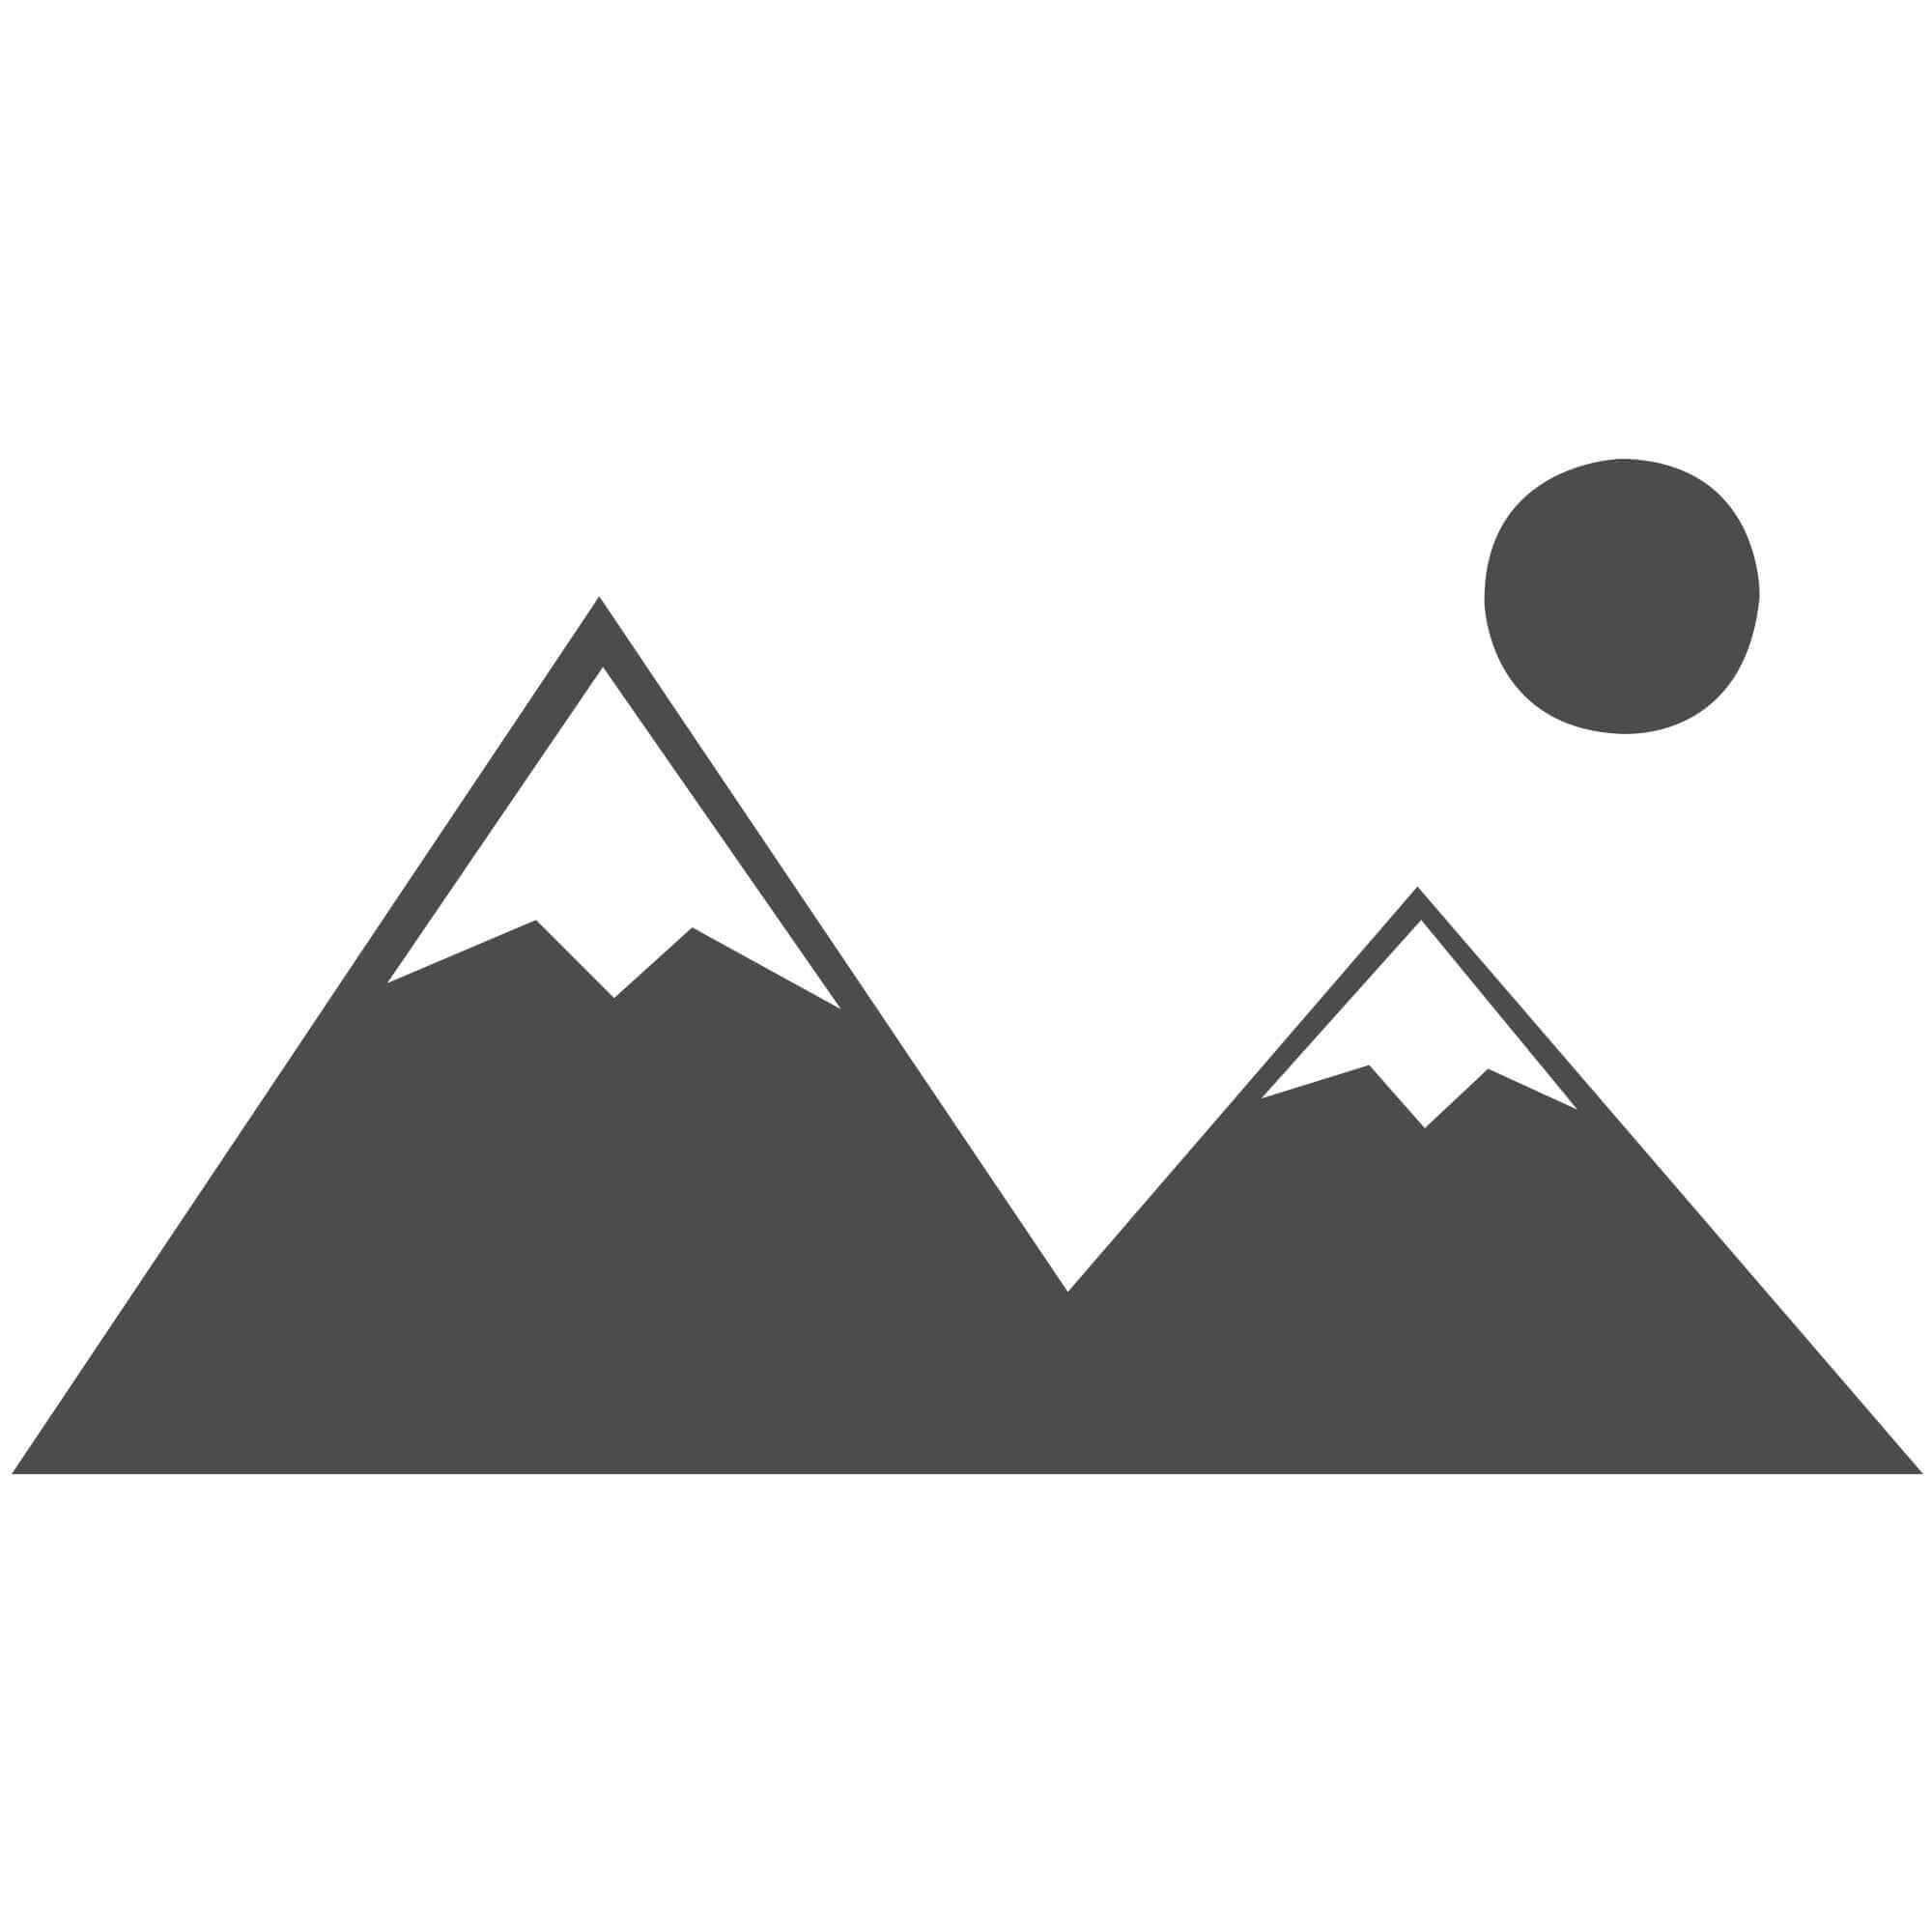 "Verge Furrow Ochre Rug - Size 80 x 150 cm (2'8"" x 5')"